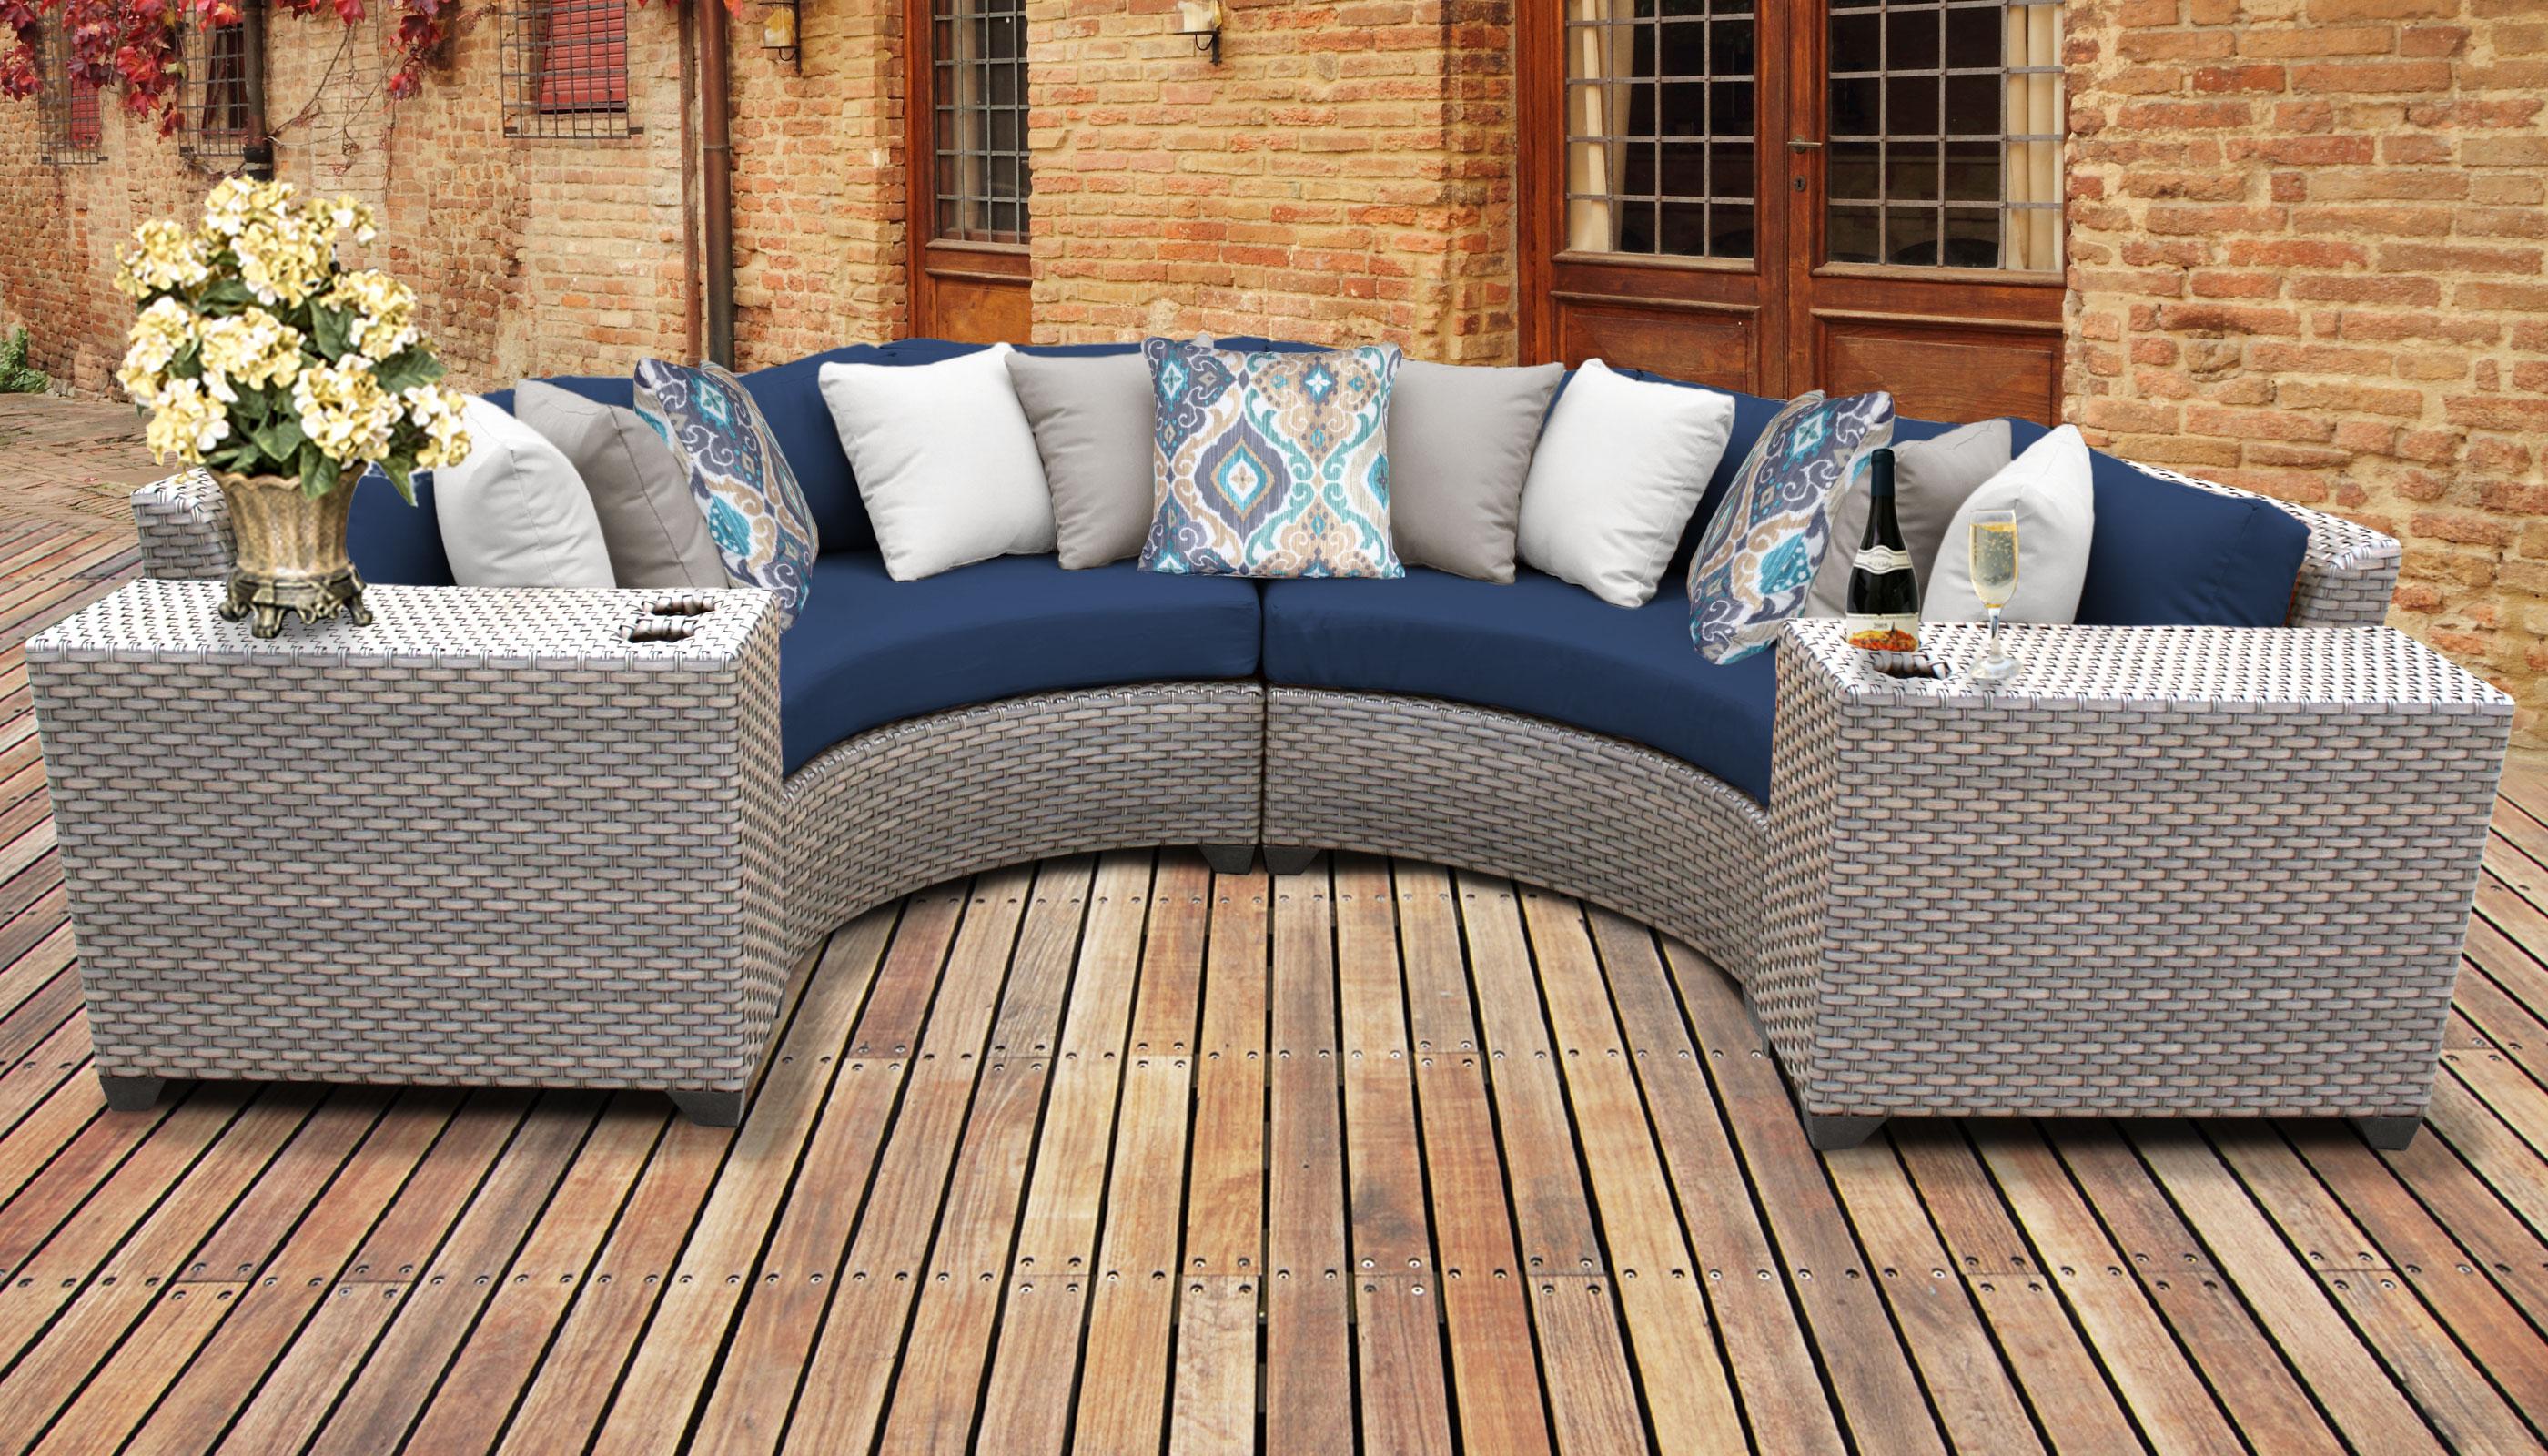 Navy Florence 4 Piece Outdoor Wicker Patio Furniture Set 04c Tk Clics